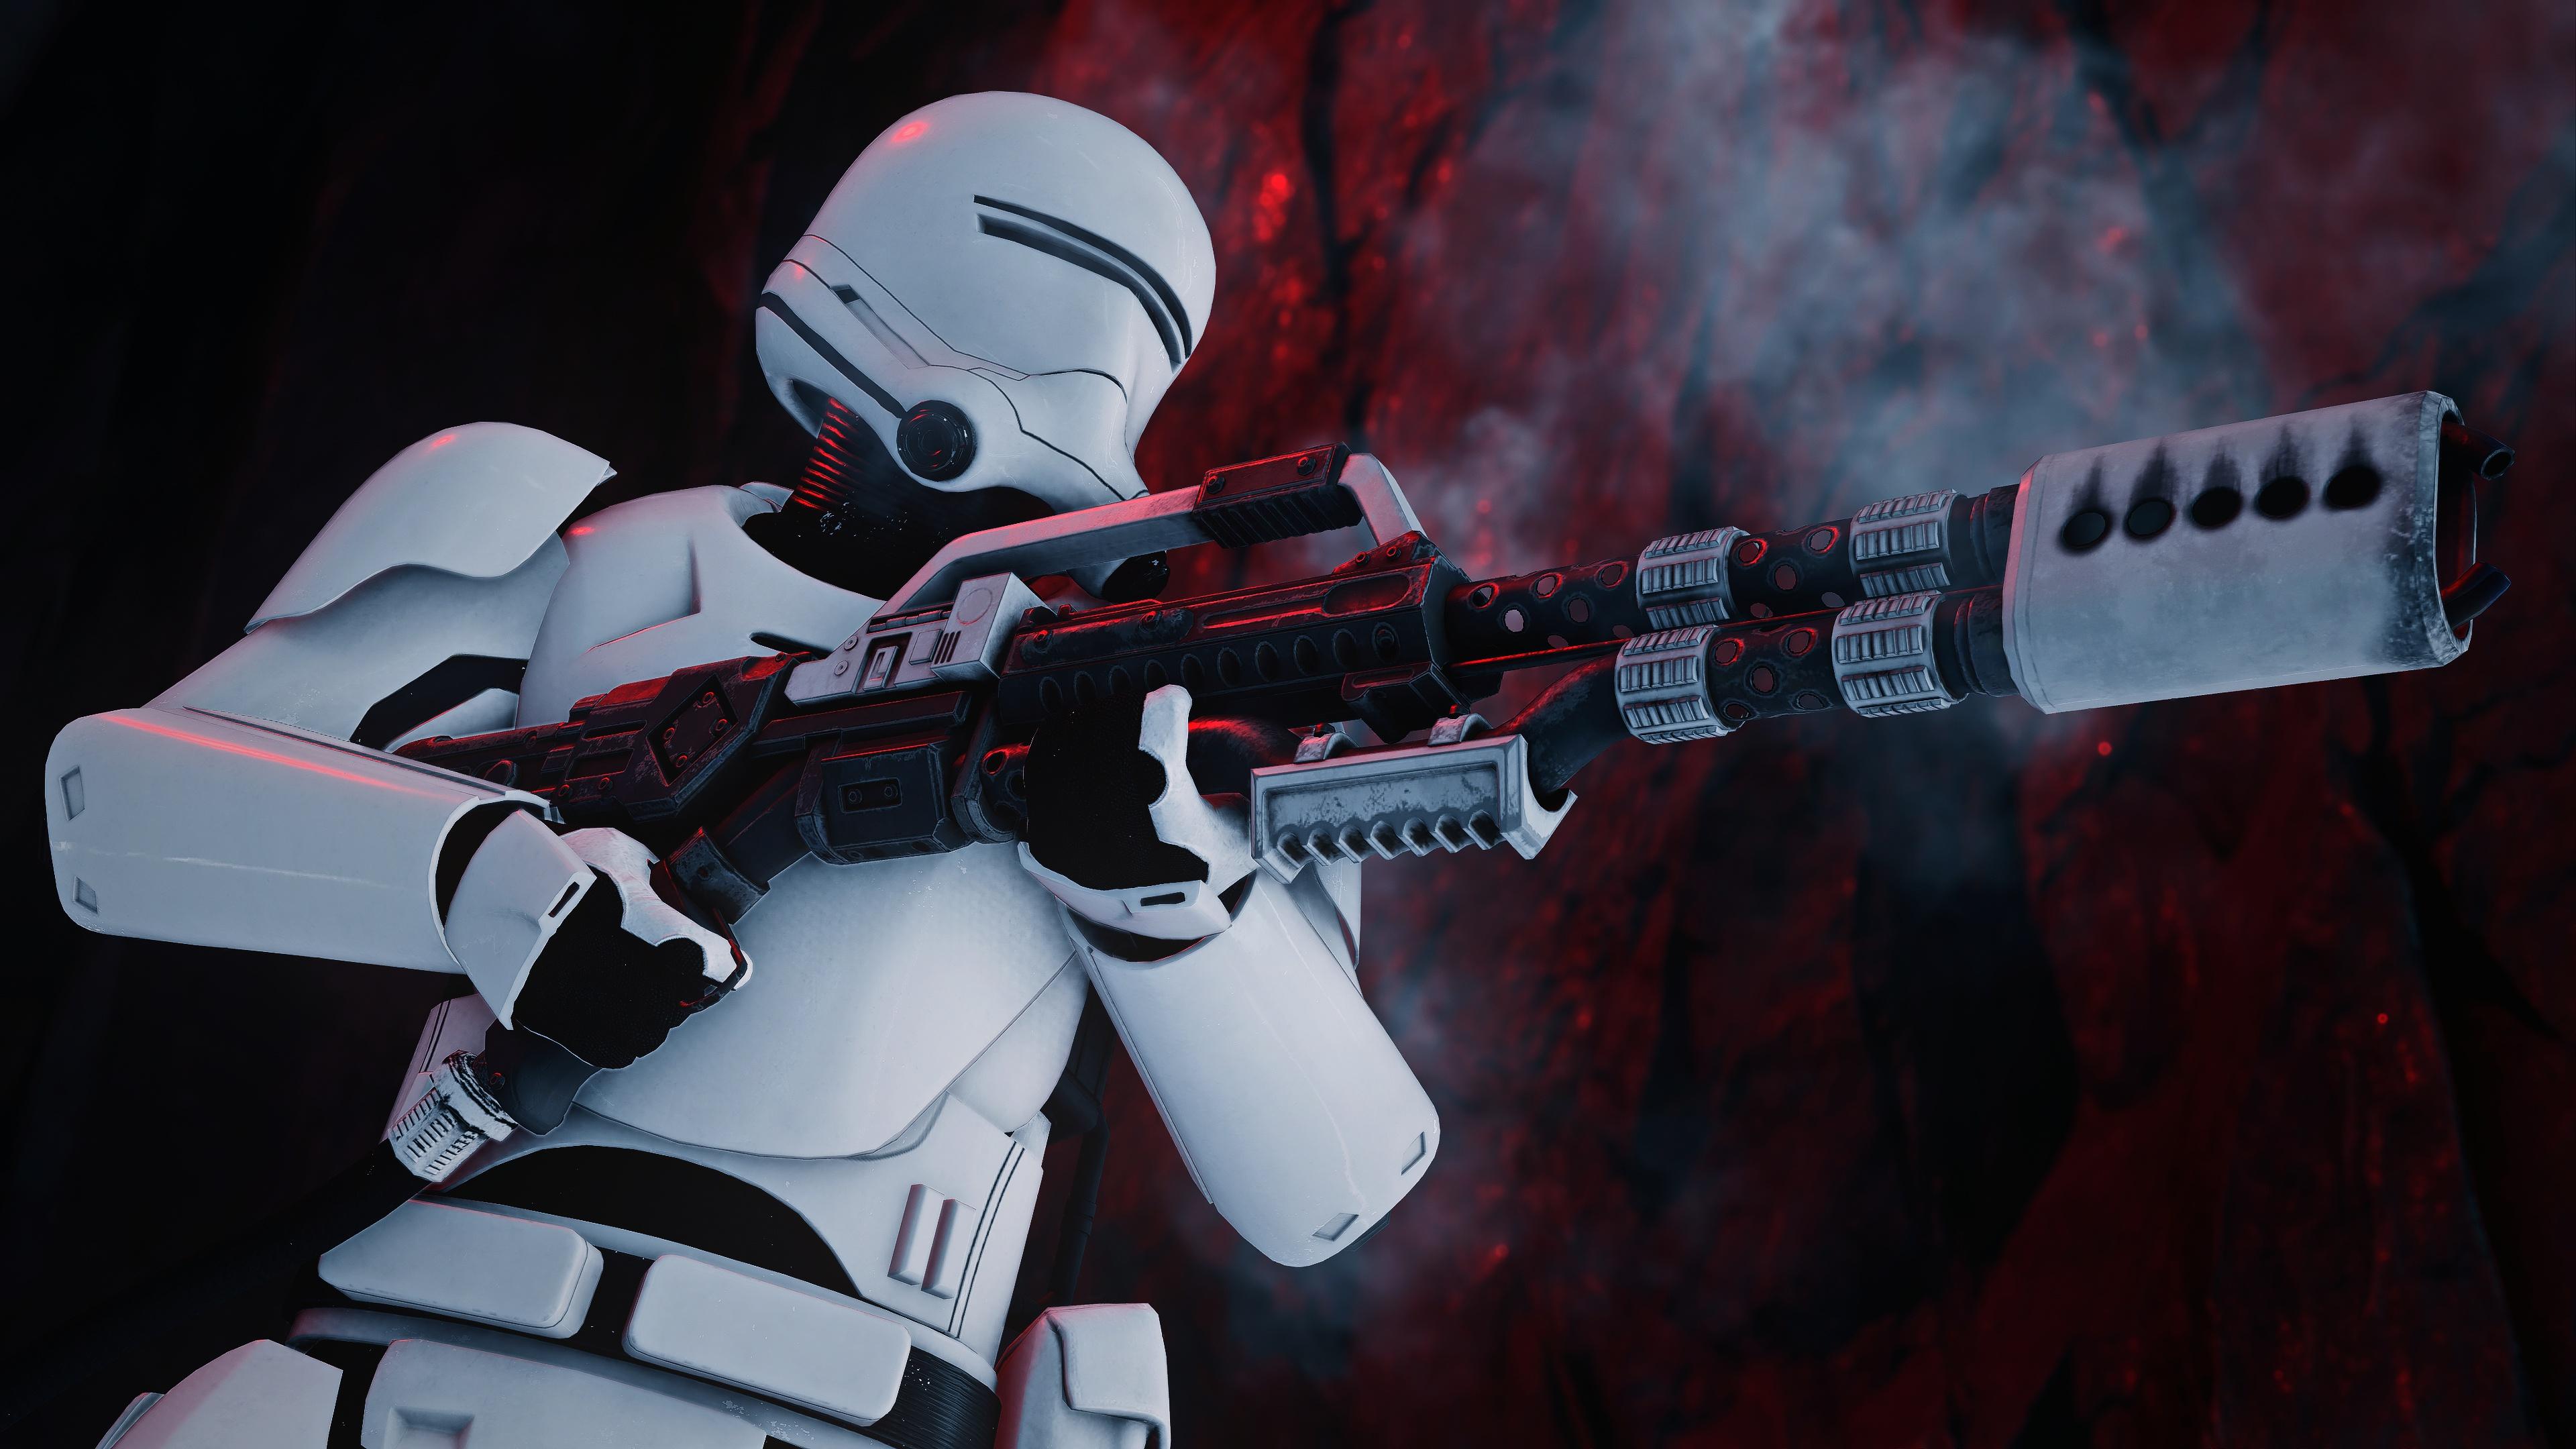 Star Wars Battlefront Ii 2017 4k Ultra Hd Wallpaper Background Image 3840x2160